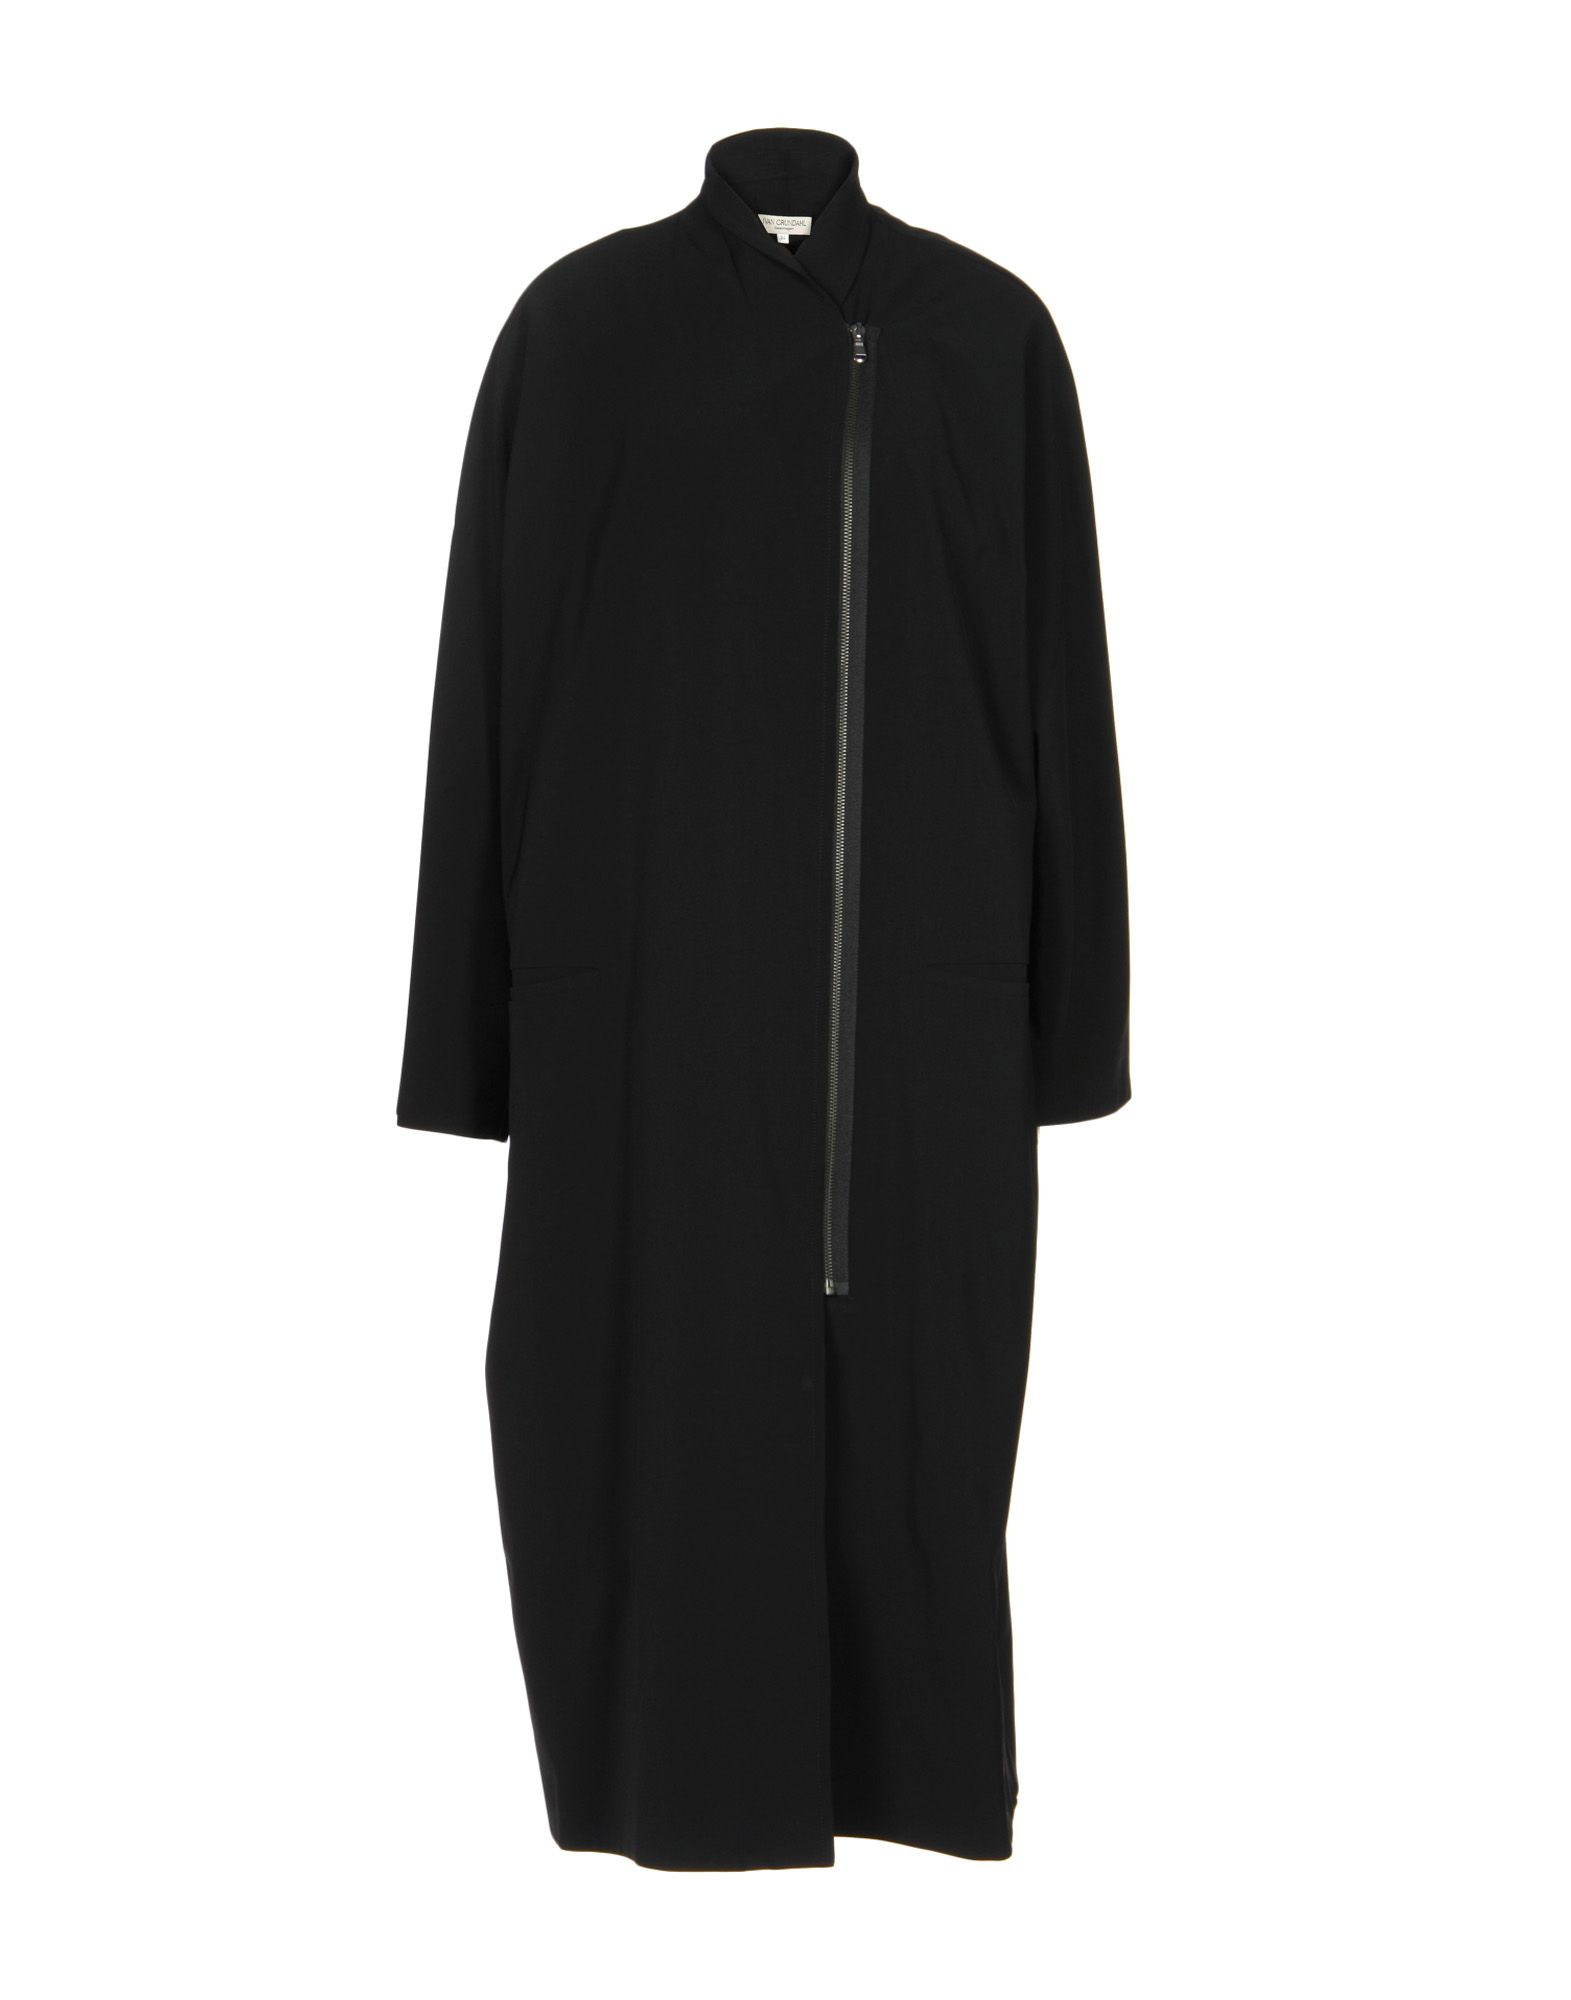 IVAN GRUNDAHL Coat in Black